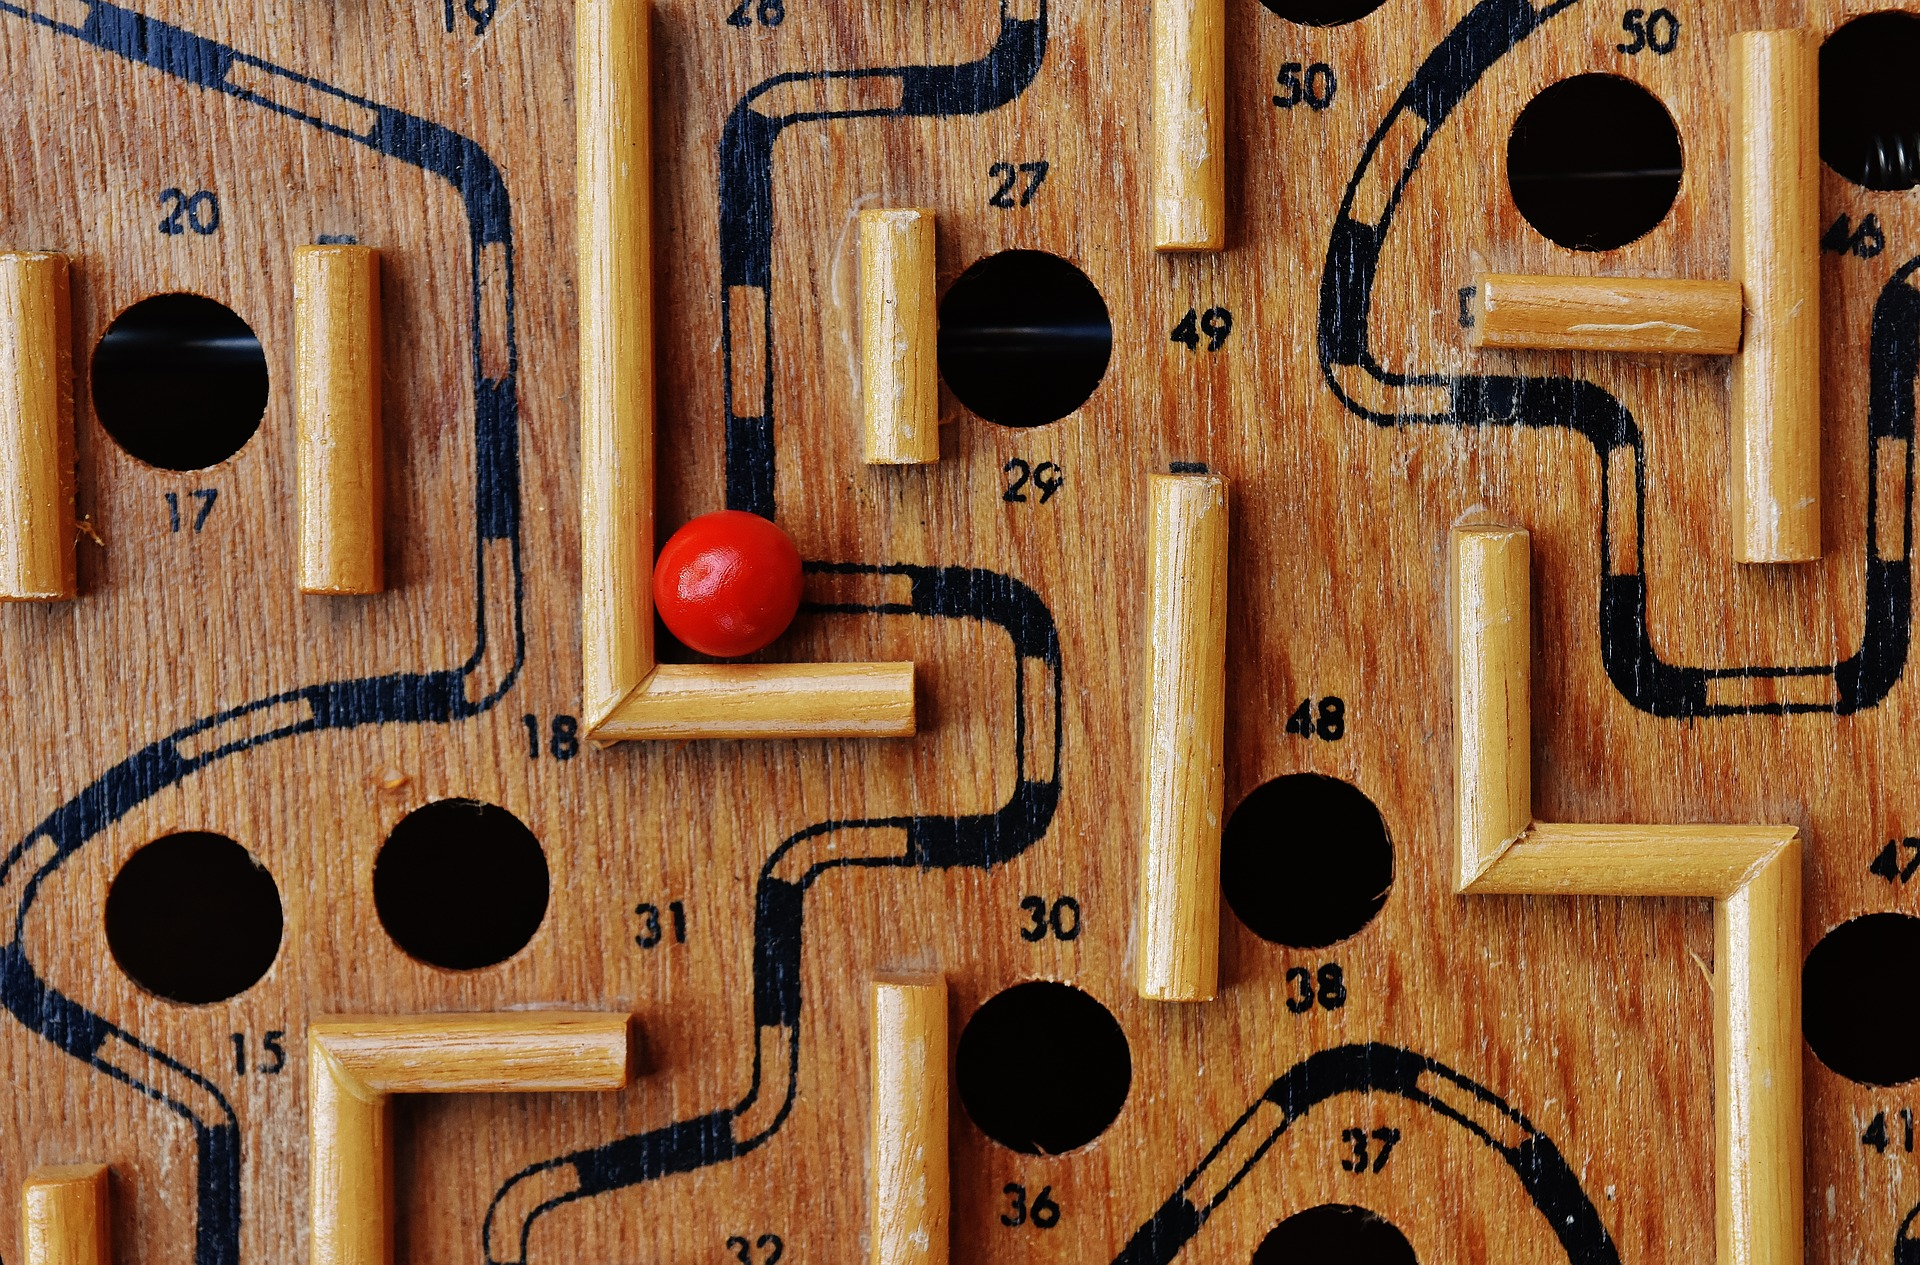 labyrinth-1738043_1920.jpg